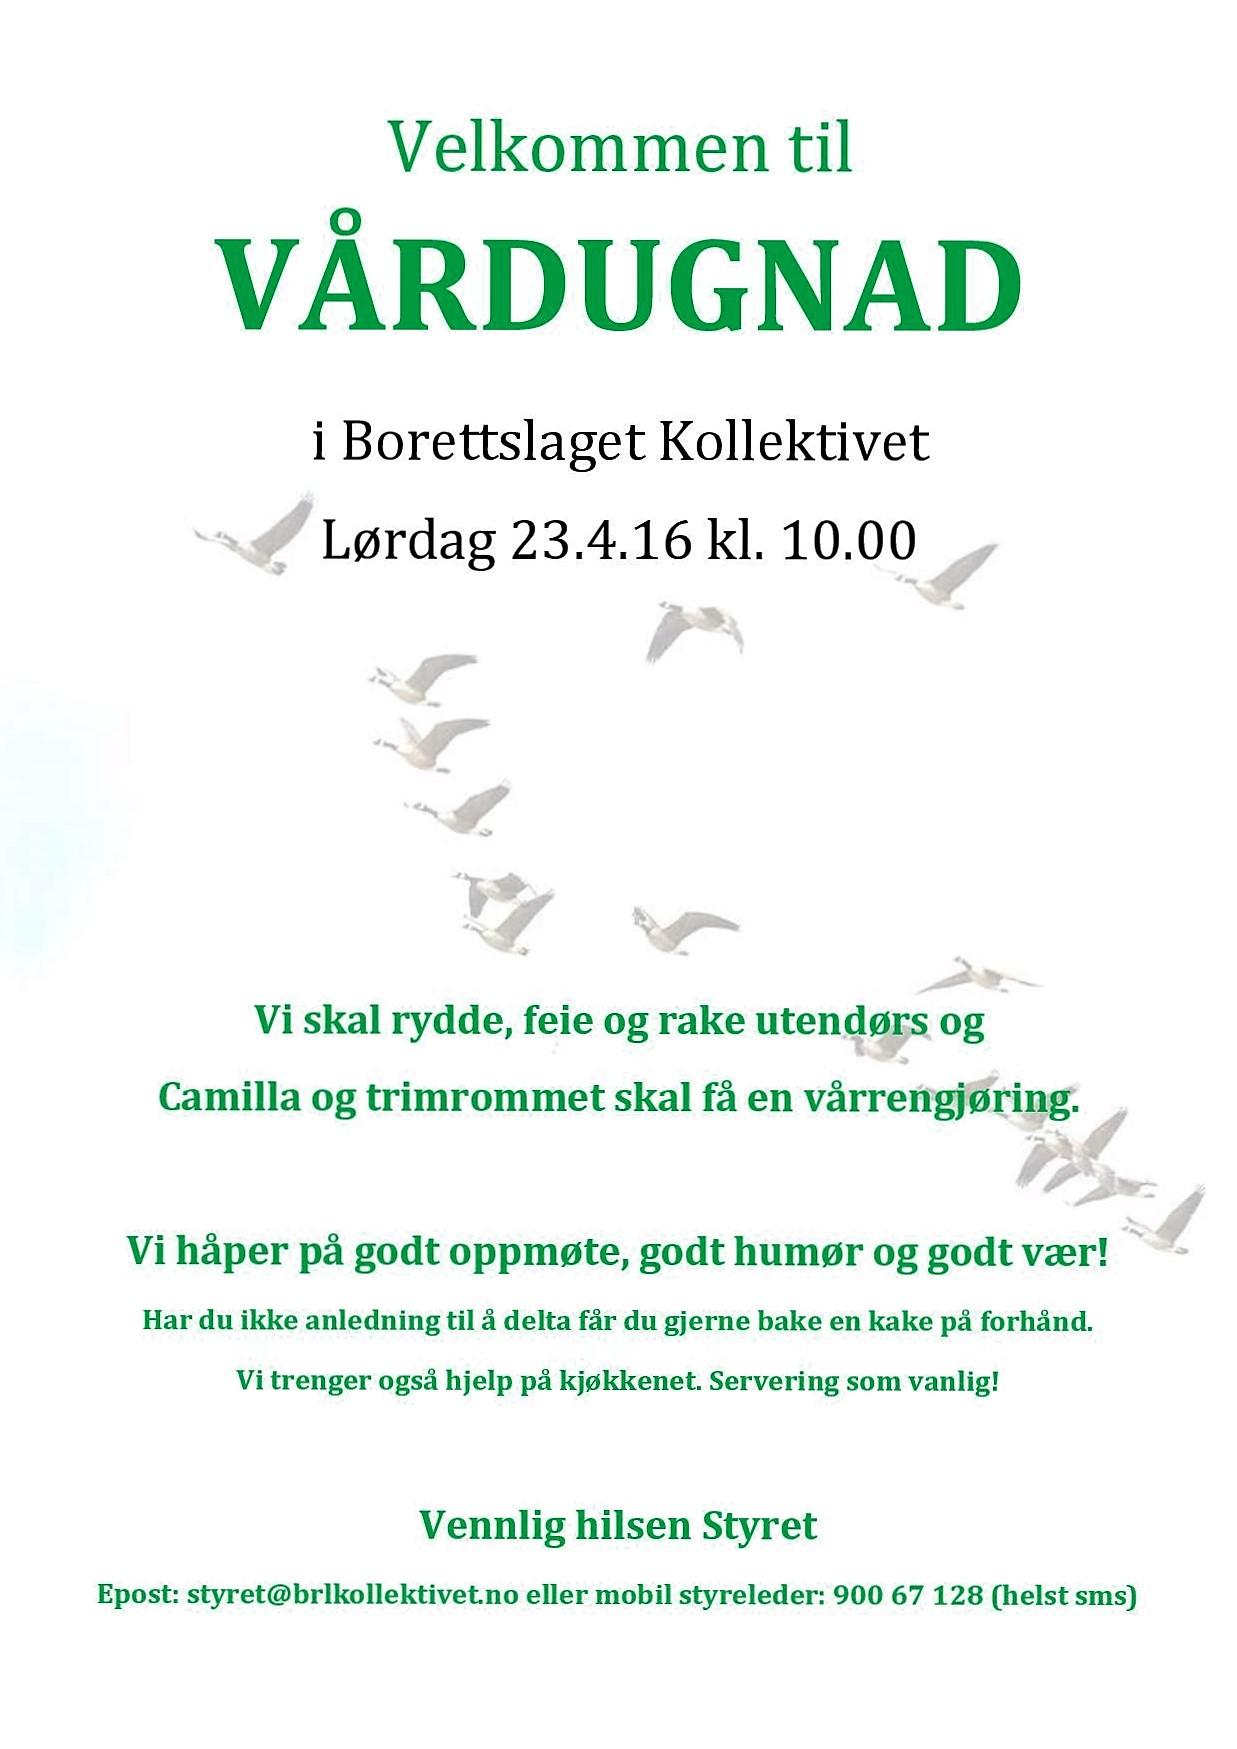 Plakat vårdugnad 2016